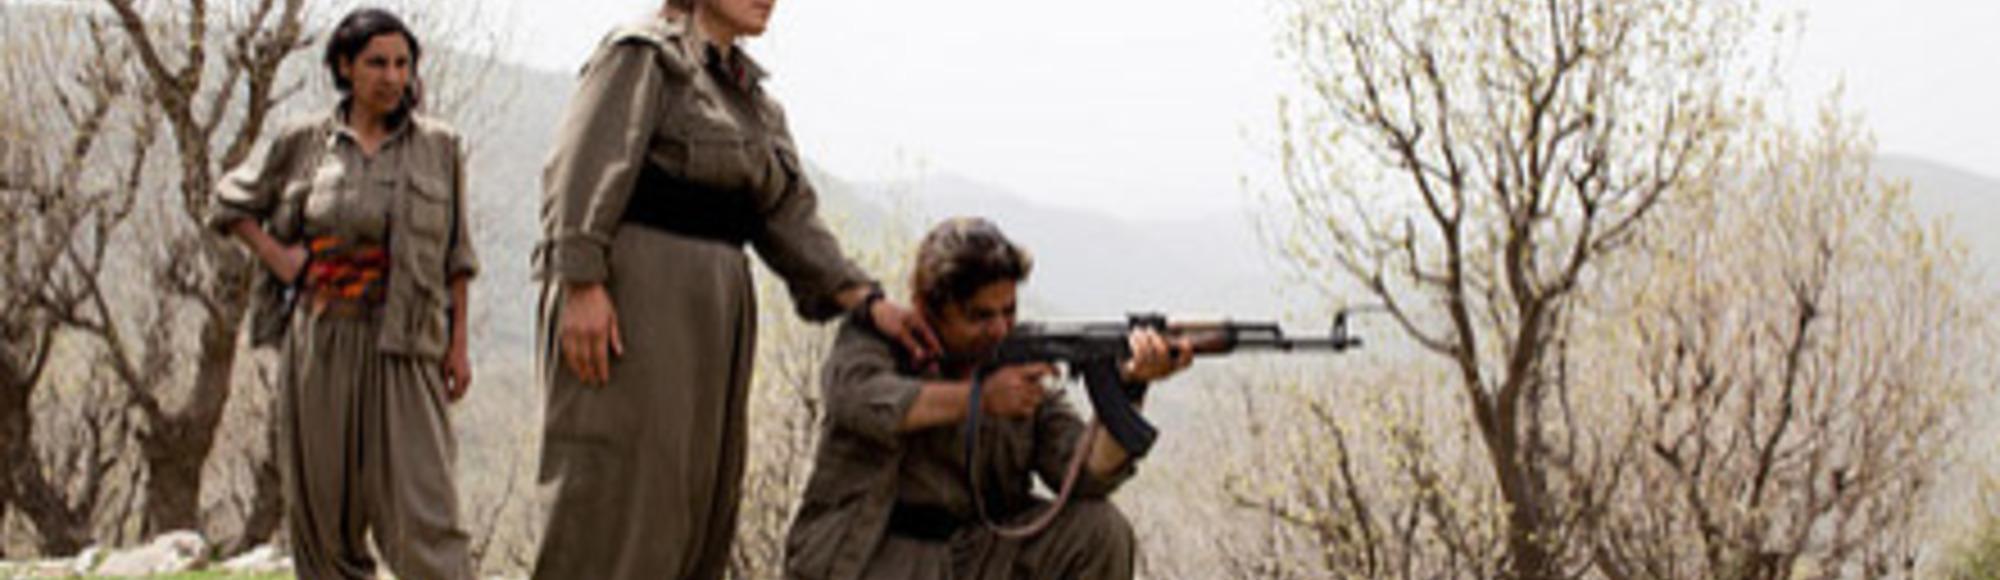 Las guerrilleras de Kurdistán